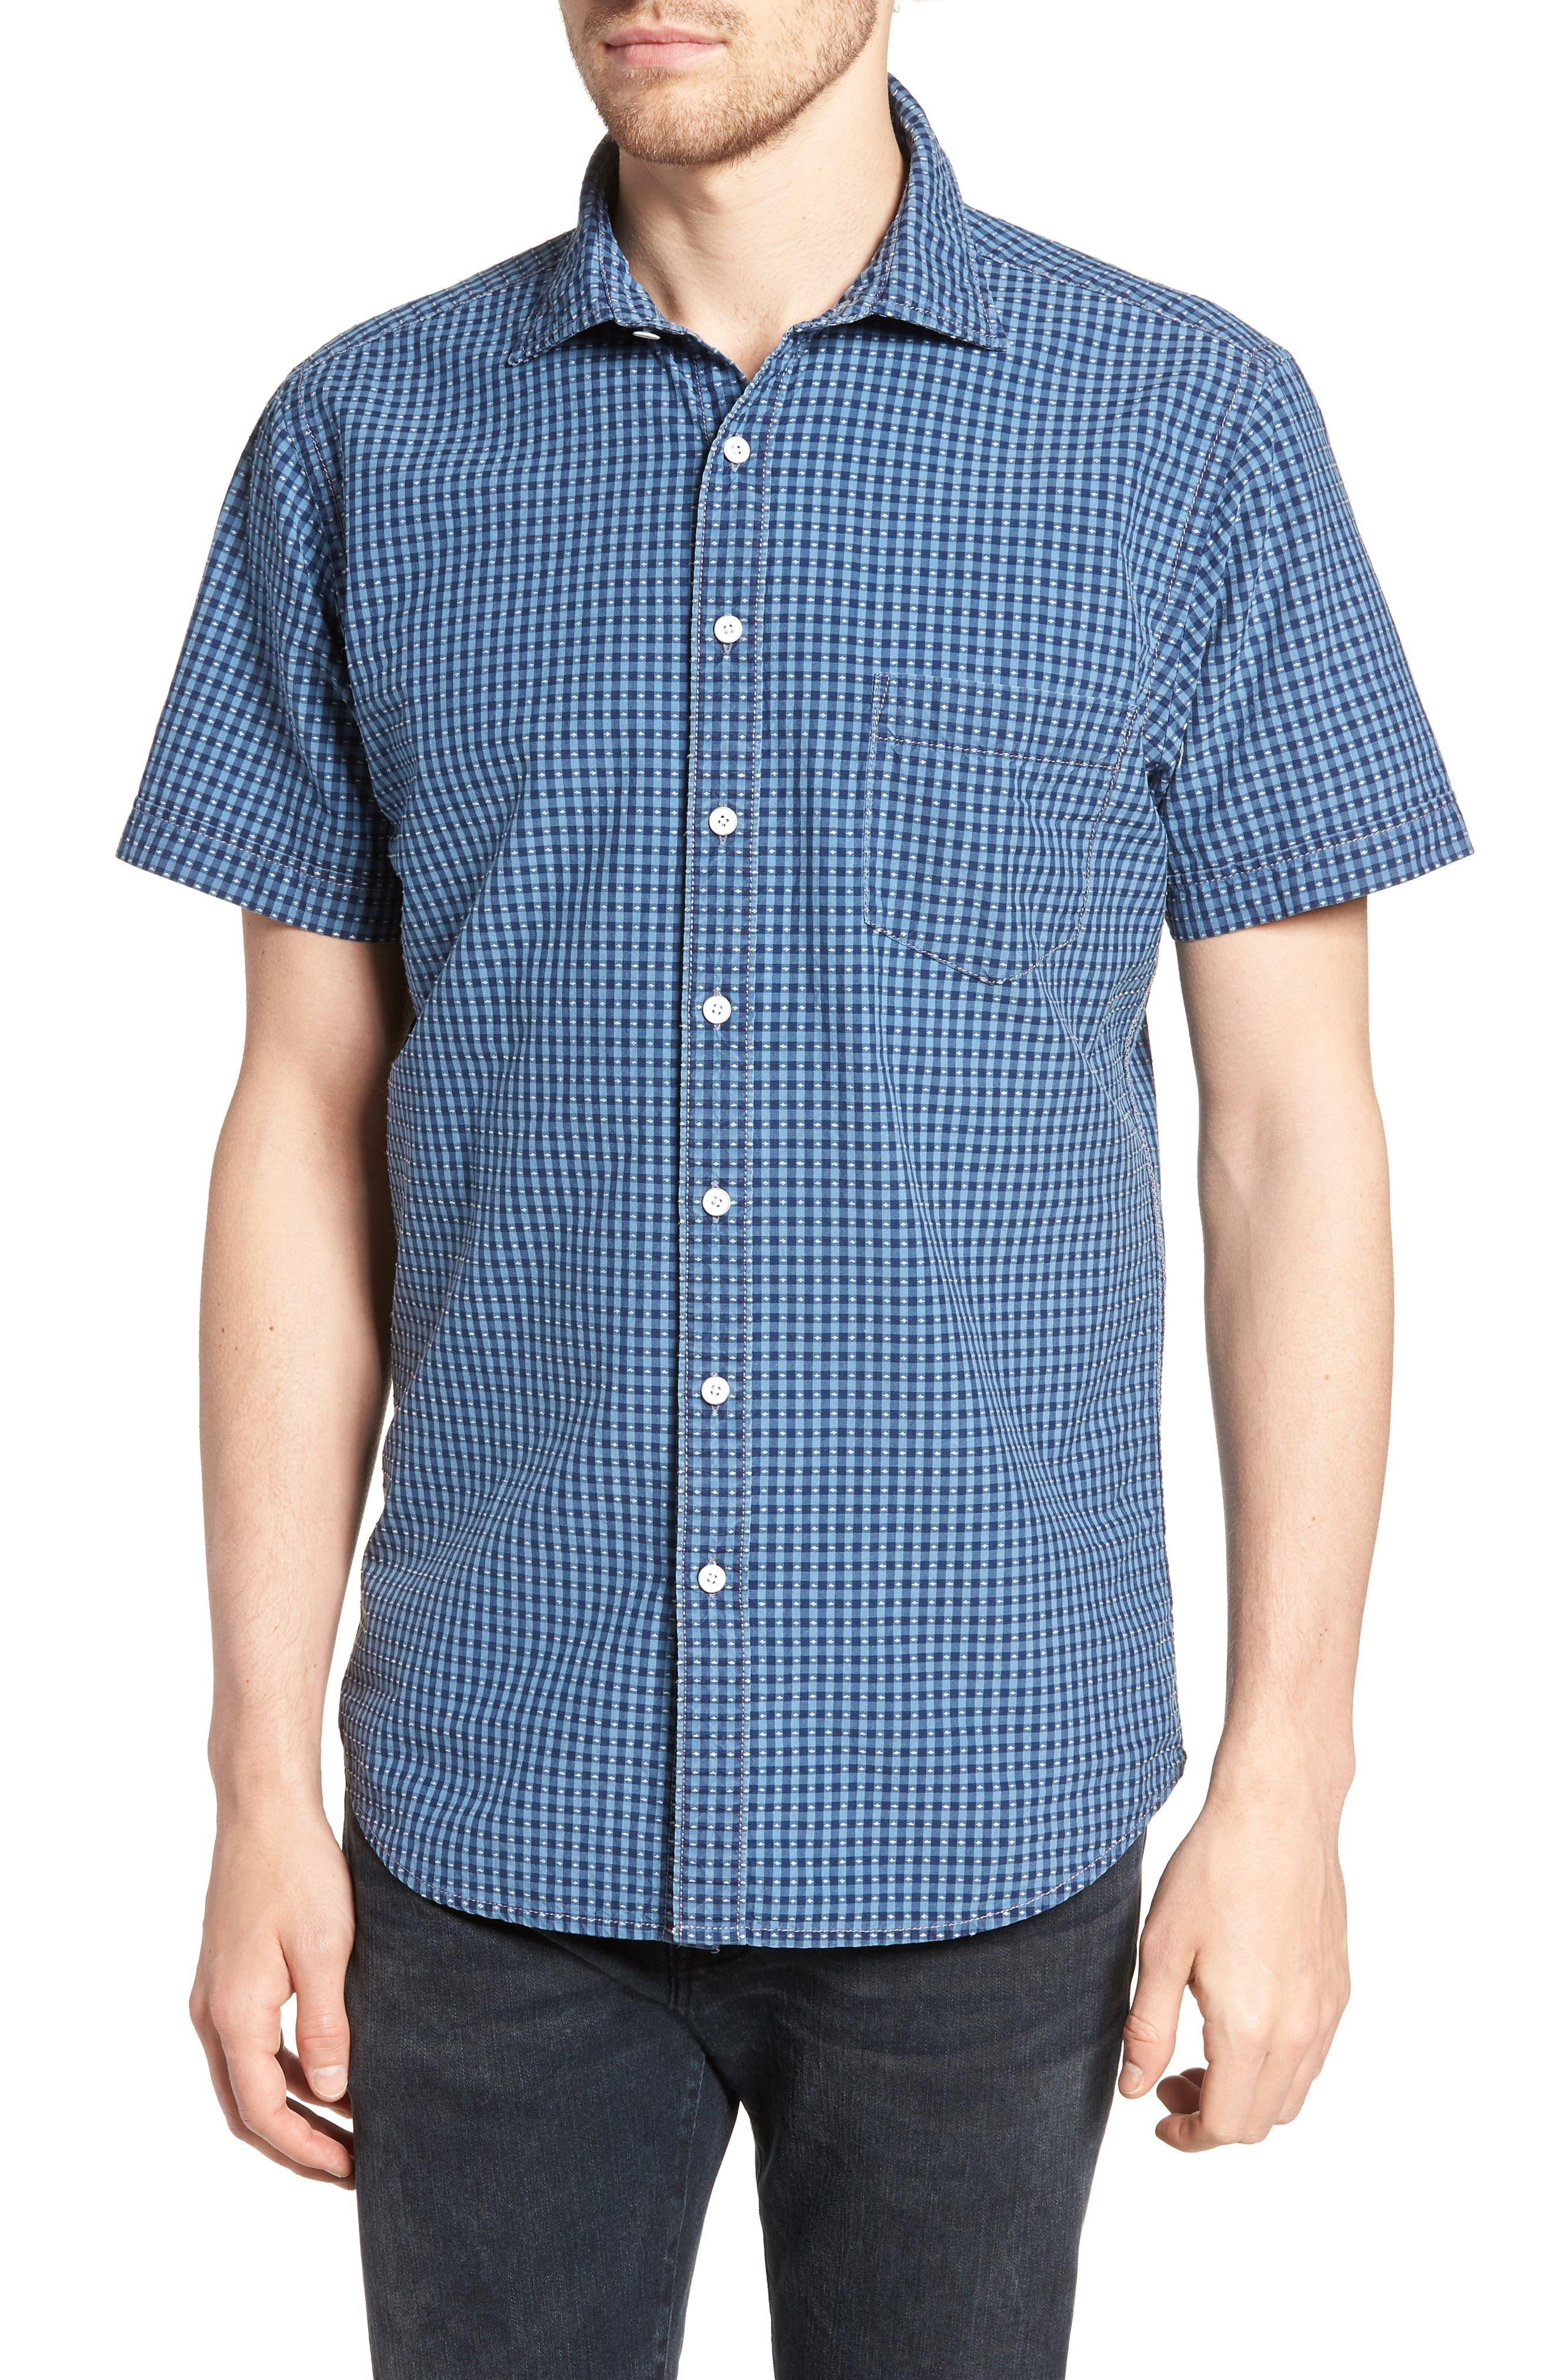 RODD & GUNN Sandon Block Sport Shirt, Main, color, 420